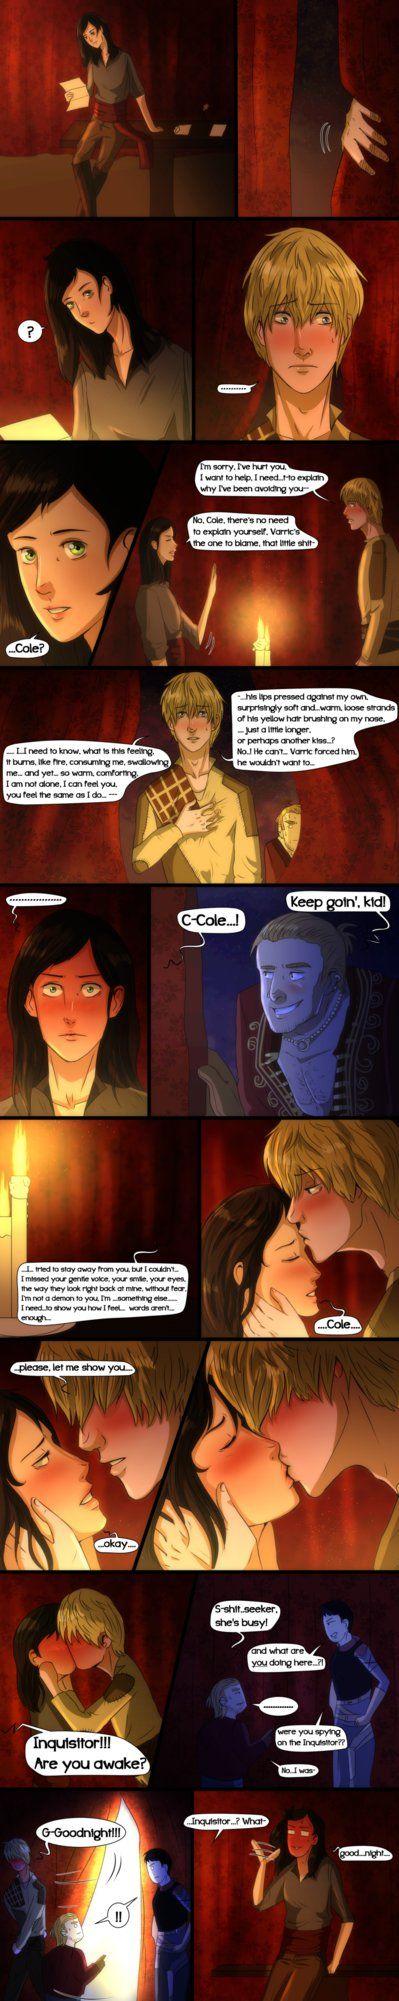 Dragon Age Inquisition- Comic- Confession by MsArtisticStuff on DeviantArt